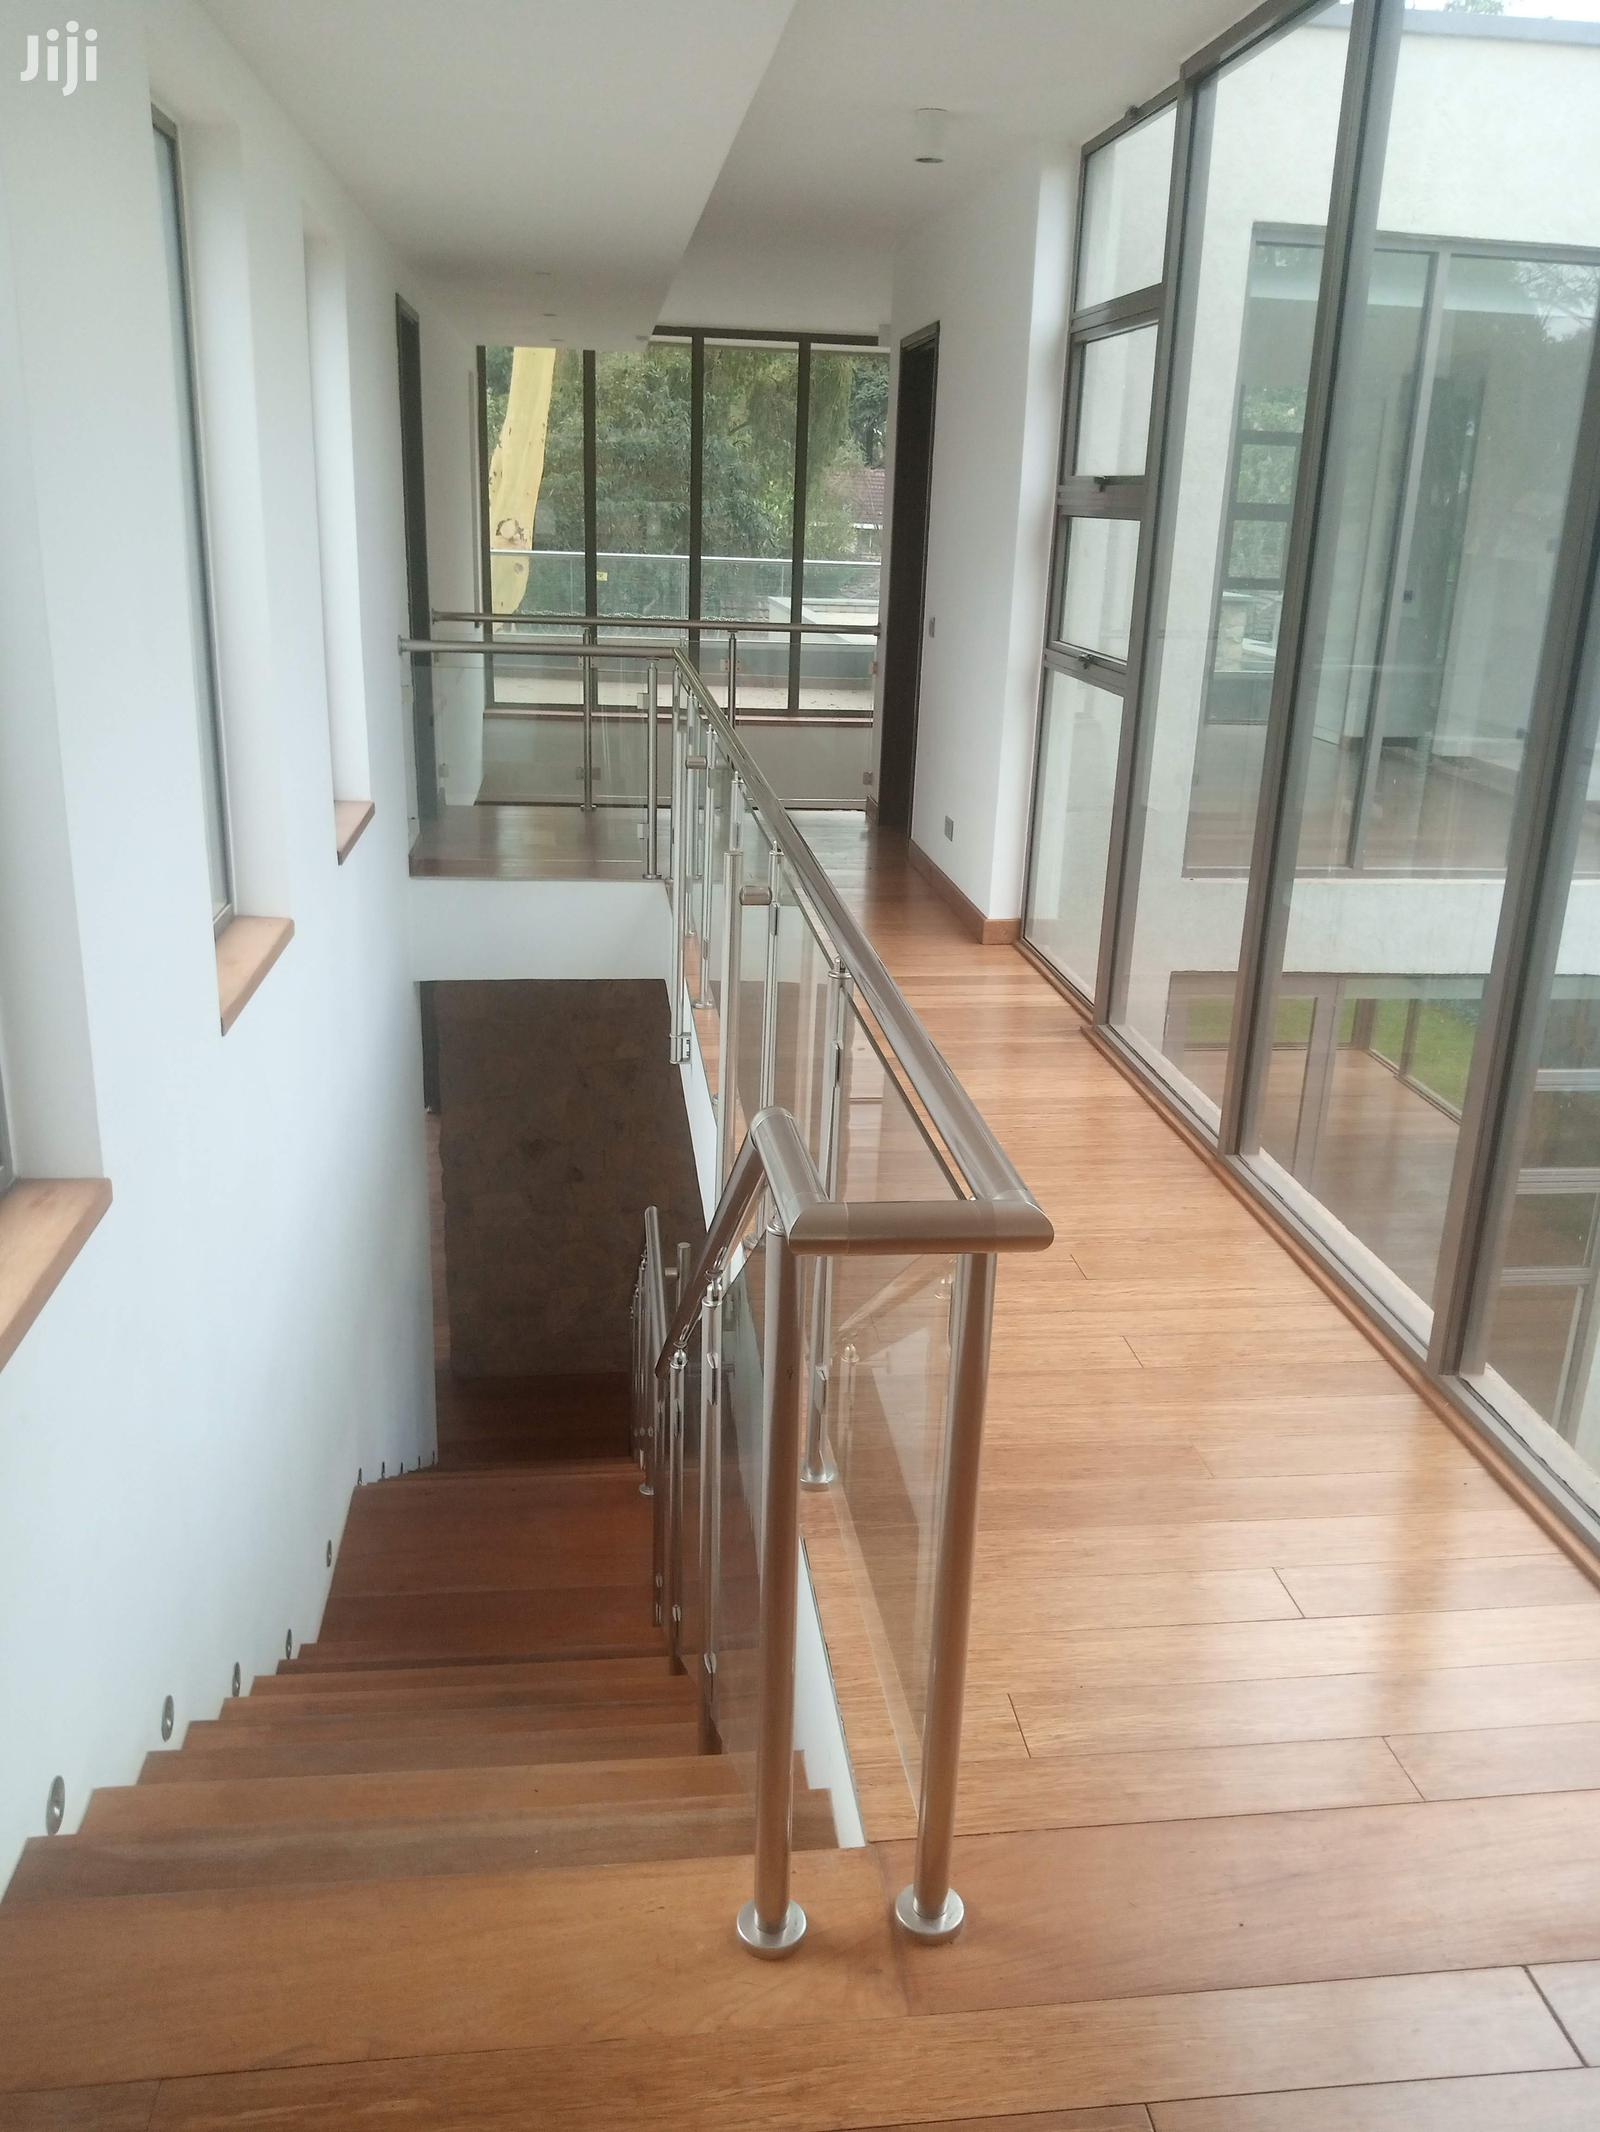 Archive: 5 Bedroom All Ensuite In Karen Miotoni